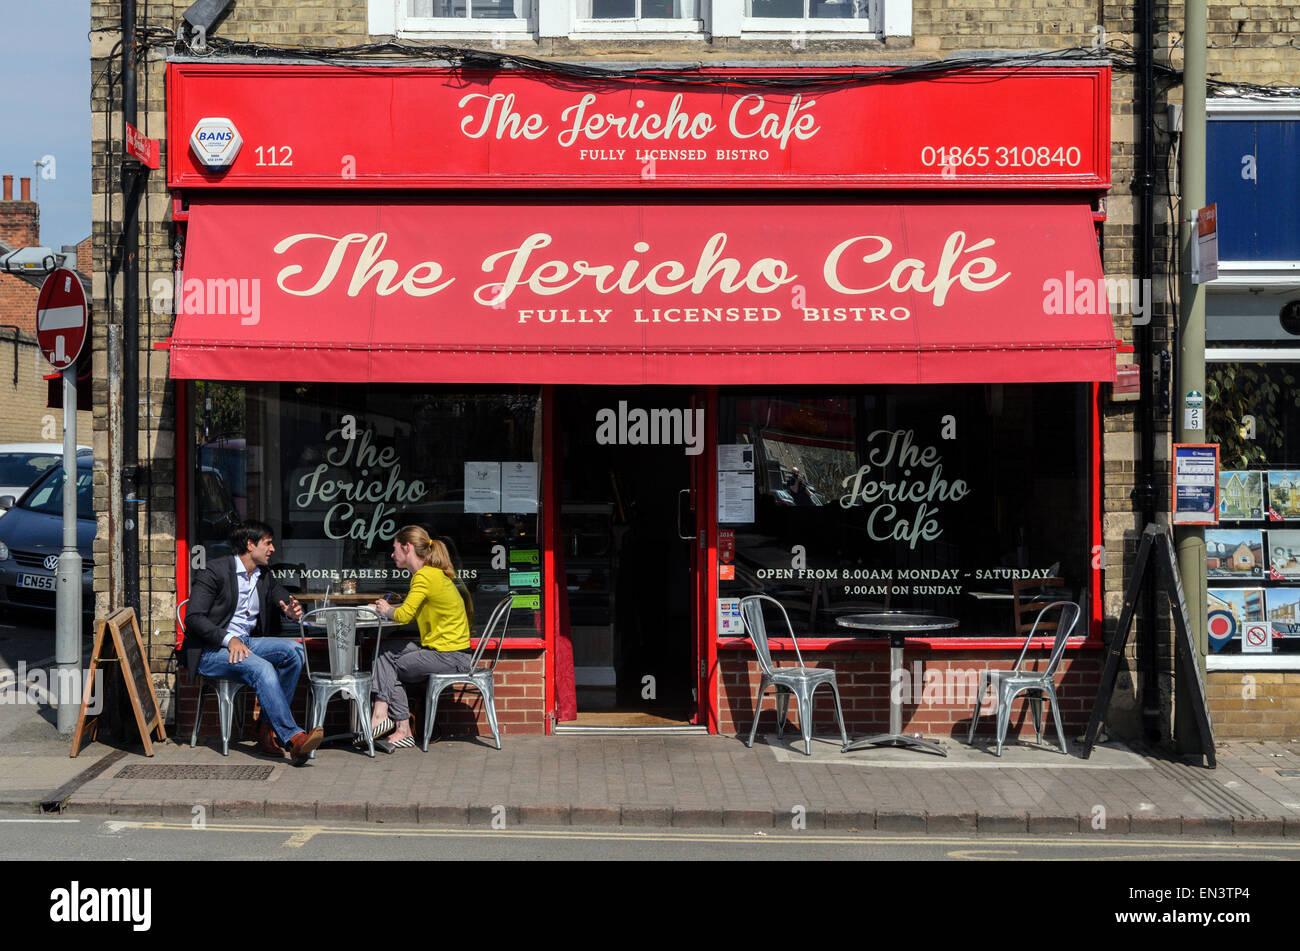 The Jericho Cafe, Walton Street, Oxford. - Stock Image